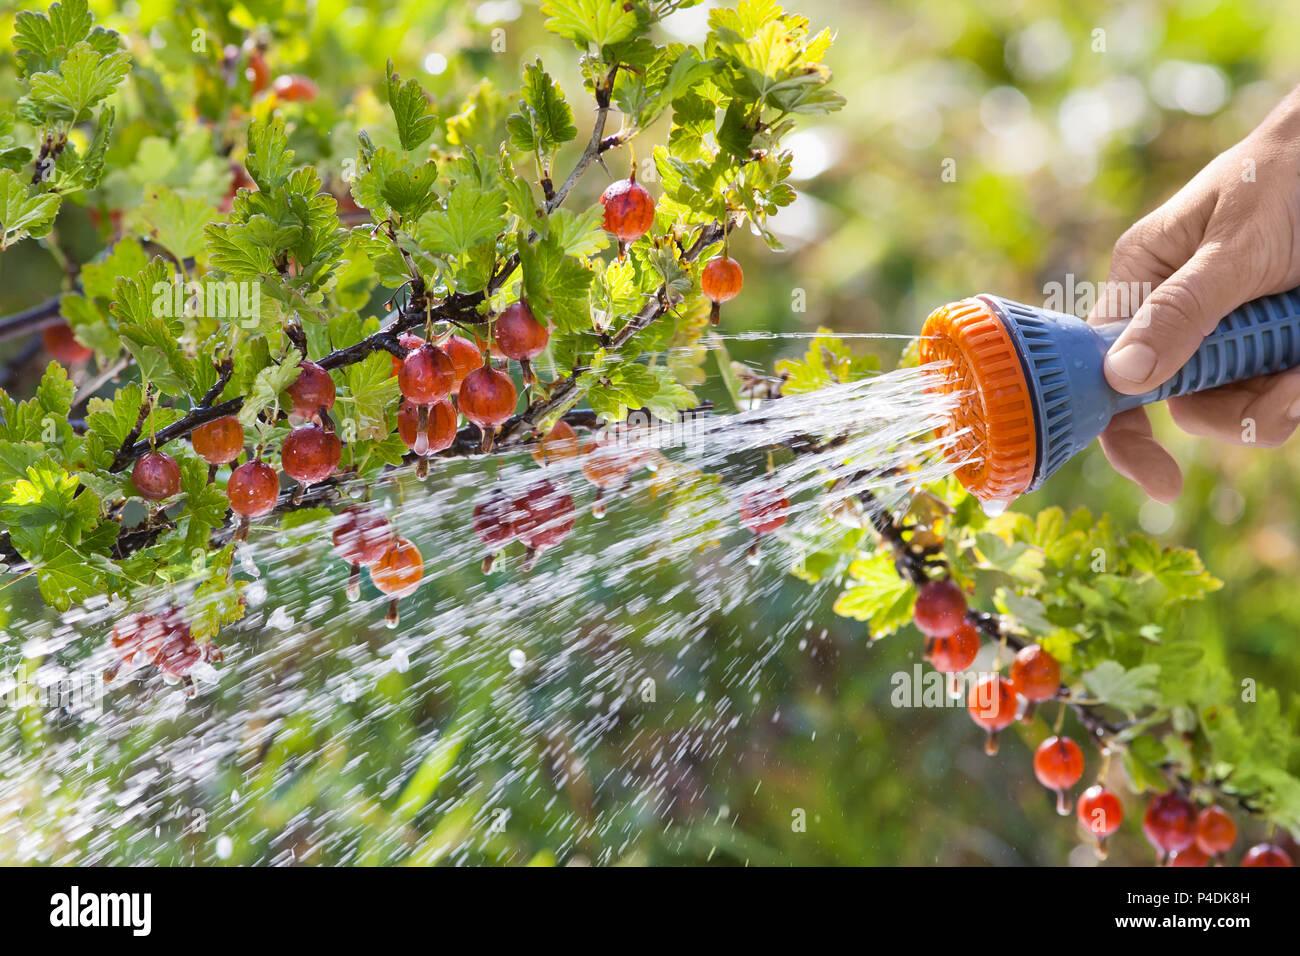 hand watering bush of gooseberry in the garden - Stock Image